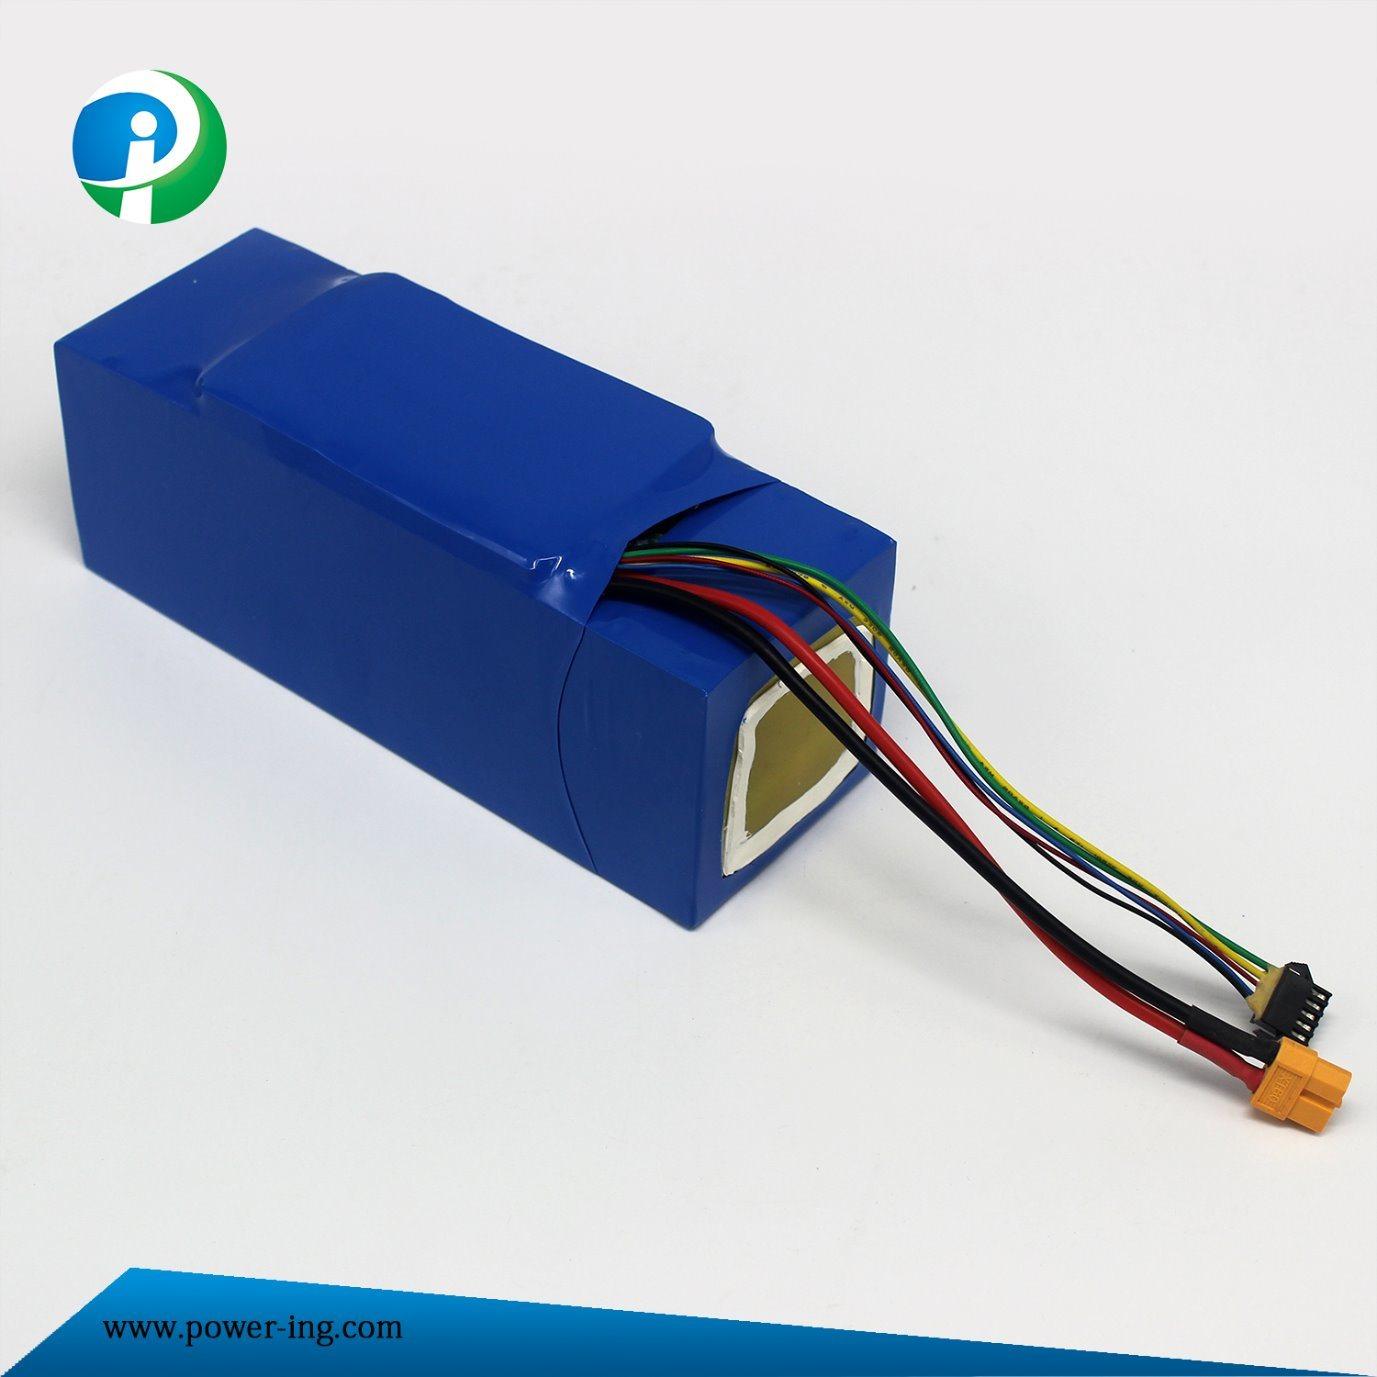 2017n 18650 Li-ion Battery for Self-Balancing Unicycle